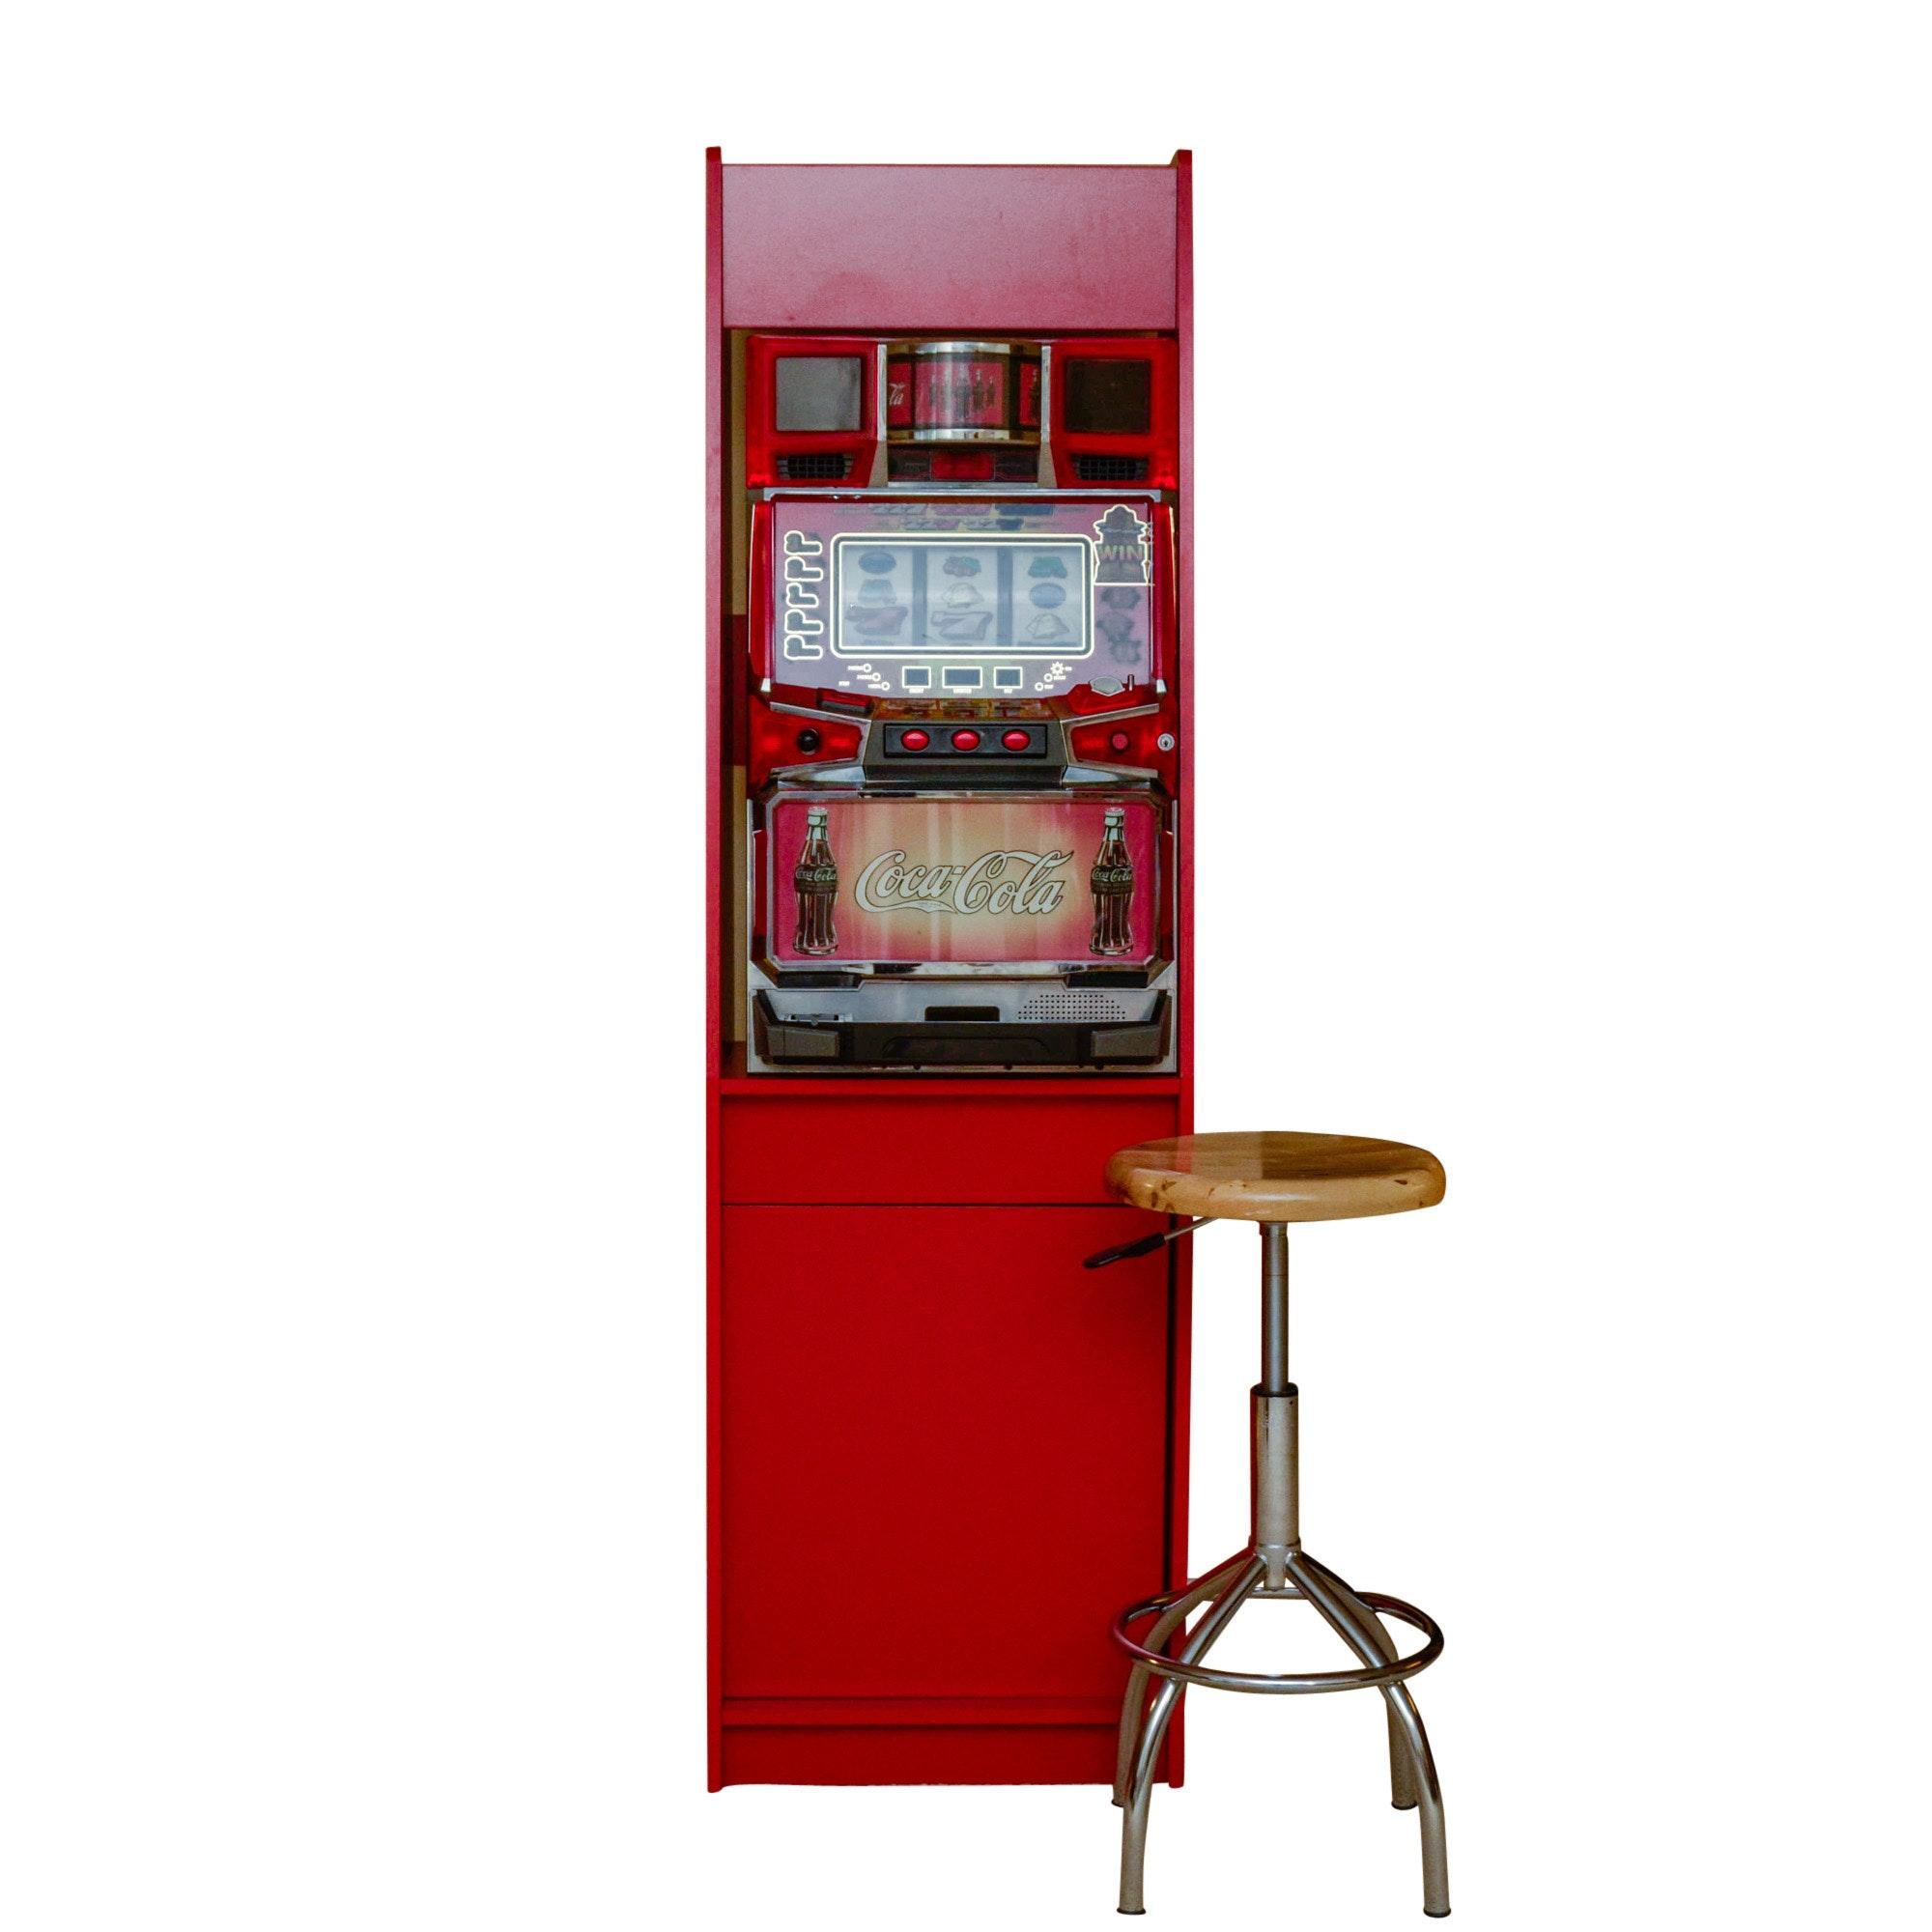 Coca-Cola Slot Machine with Stool